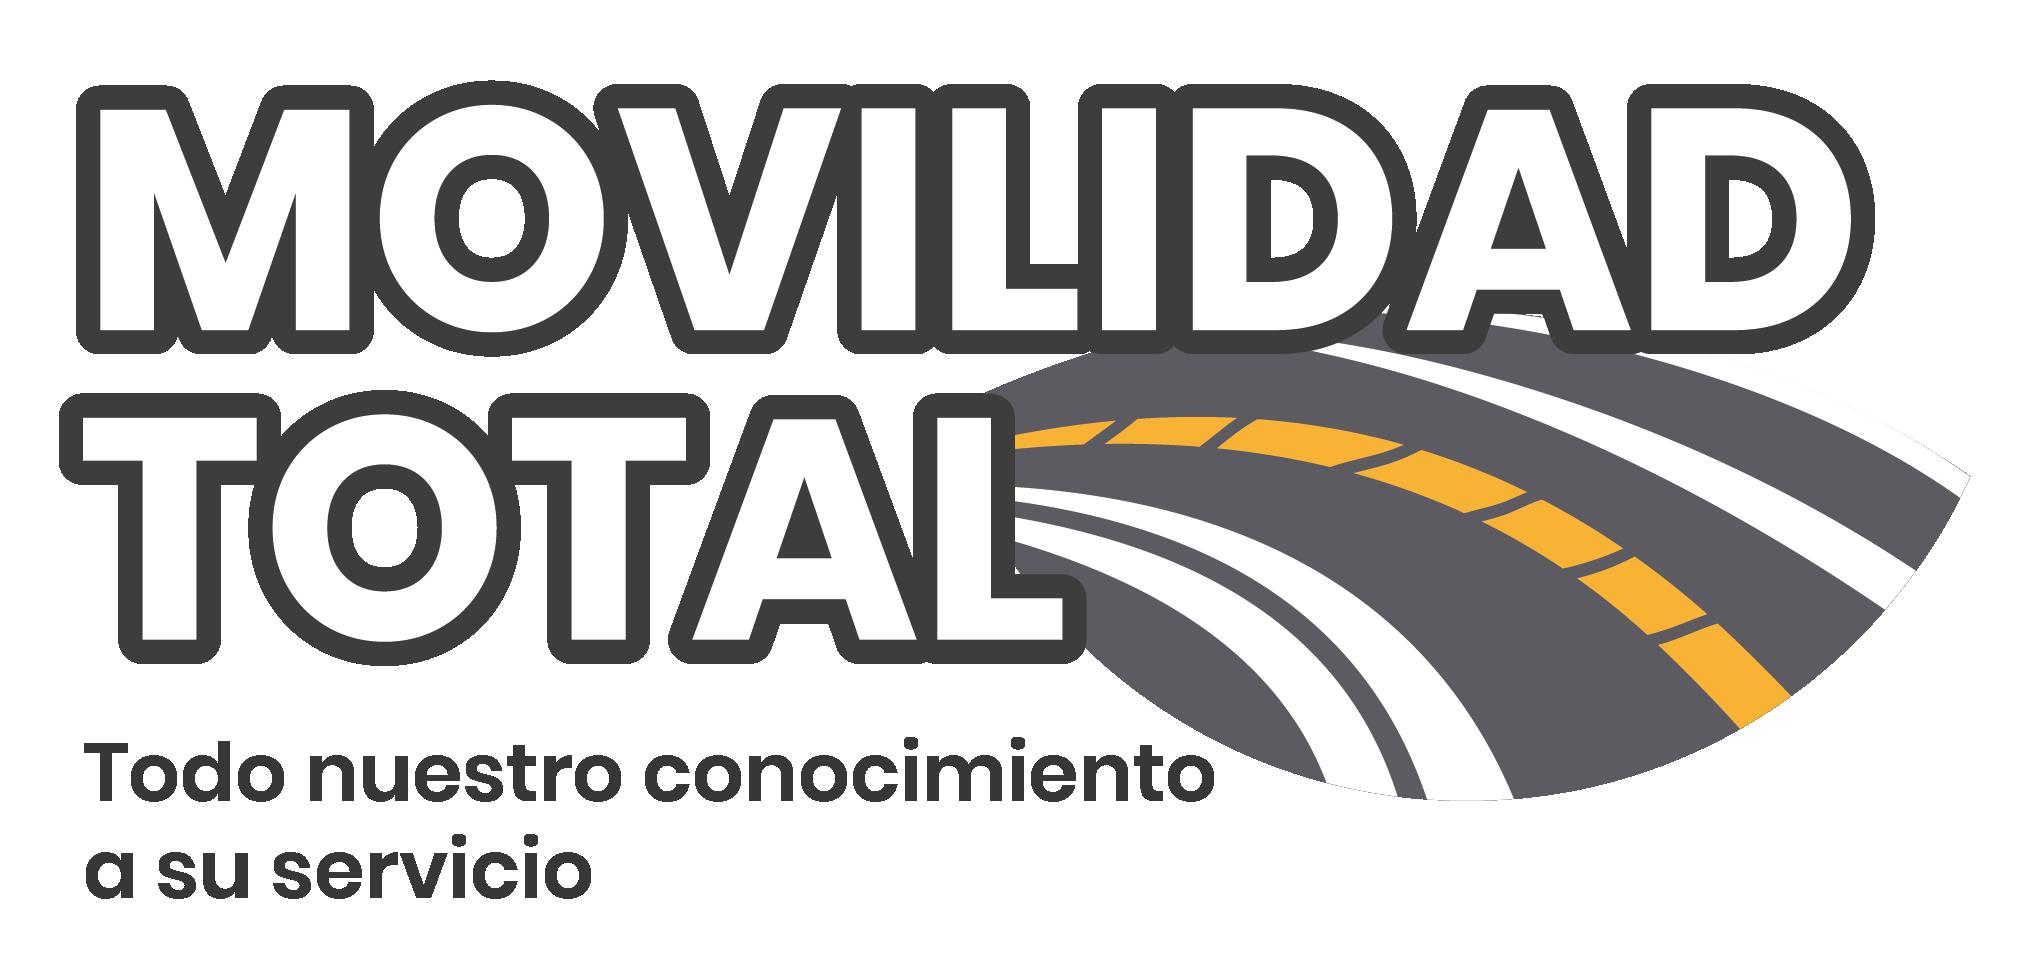 Movilidad Total